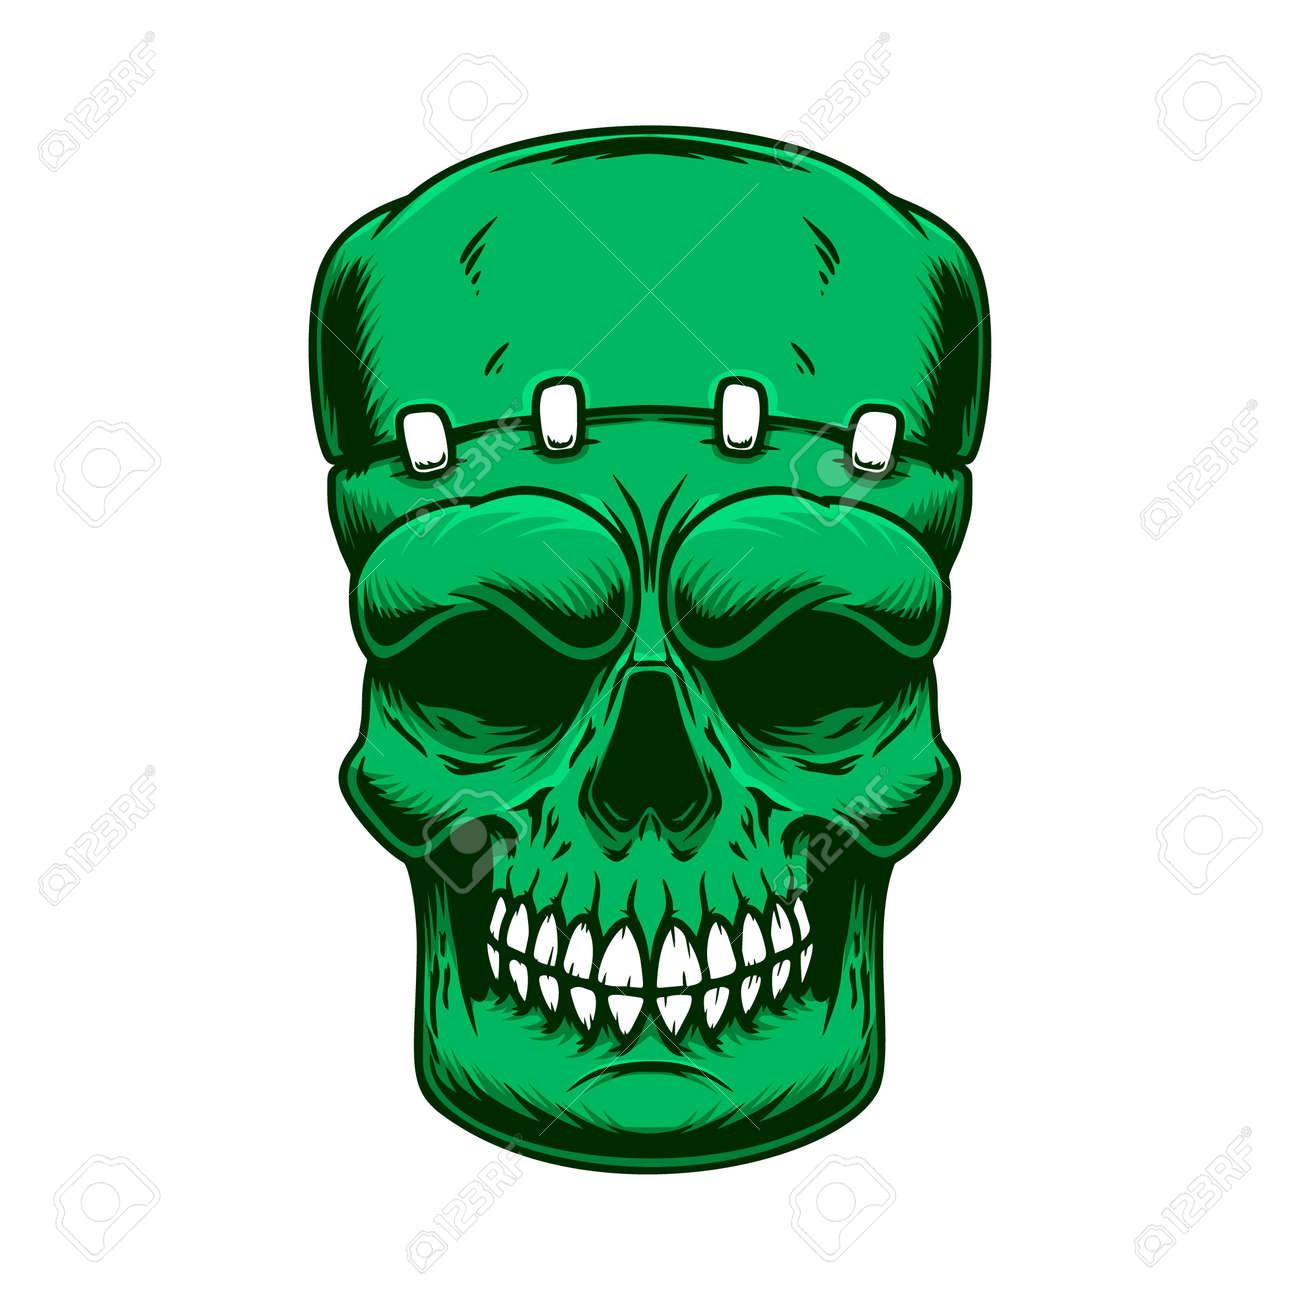 Illustration of the skull of frankenstein monster in engraving style. Design element for poster, card, banner, sign. Vector illustration - 171212915